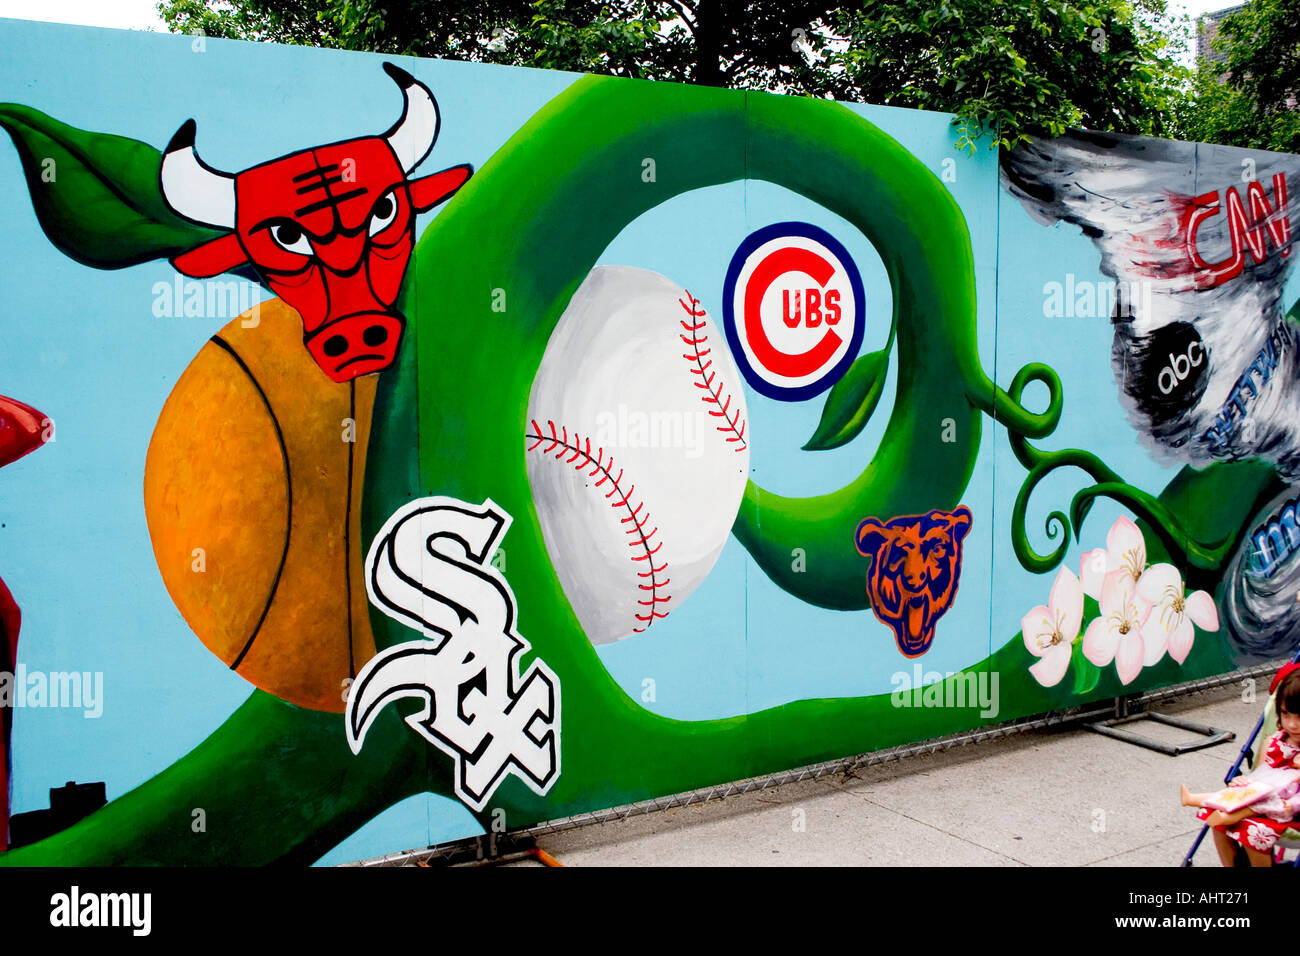 7e6b2bb227a1f Obras de arte de la calle de equipos deportivos de chicago cubs jpg  1300x956 Equipos de